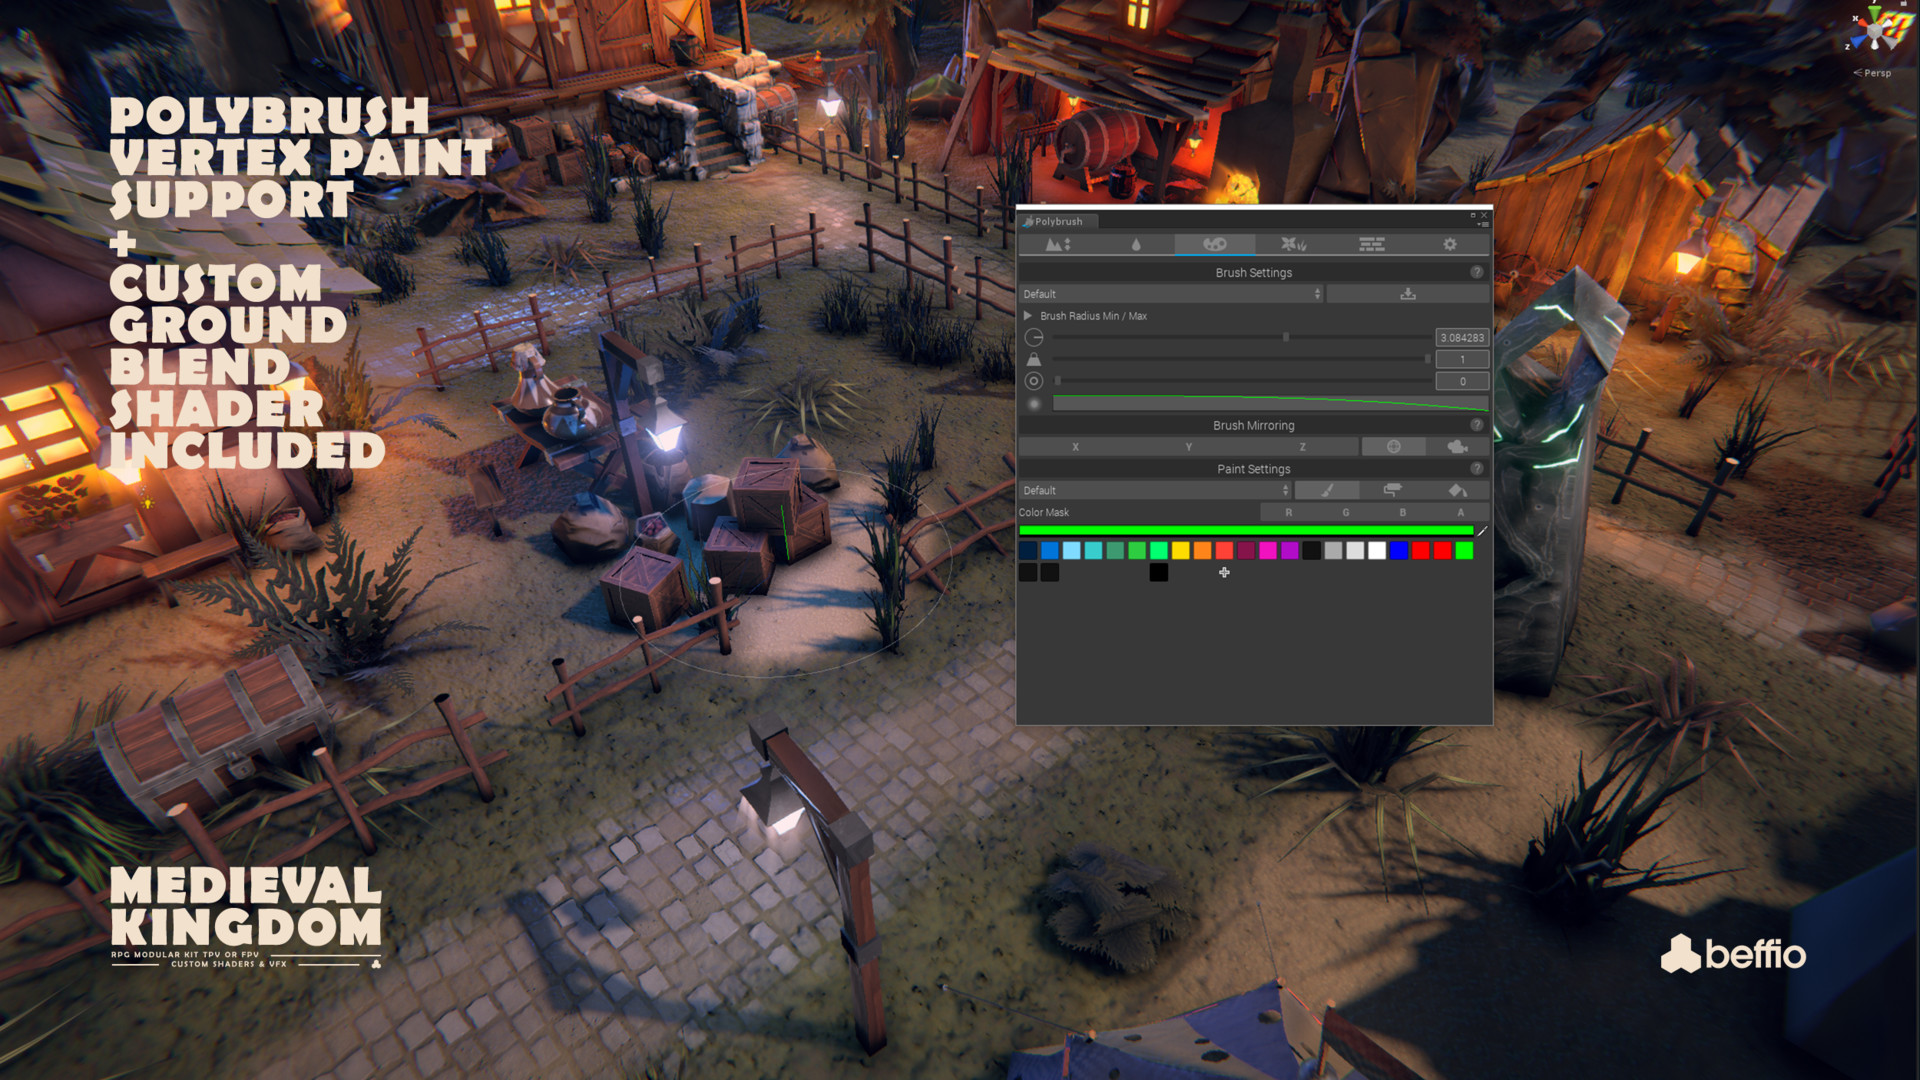 ArtStation - Medieval Kingdom - Unity3D, beffio studio